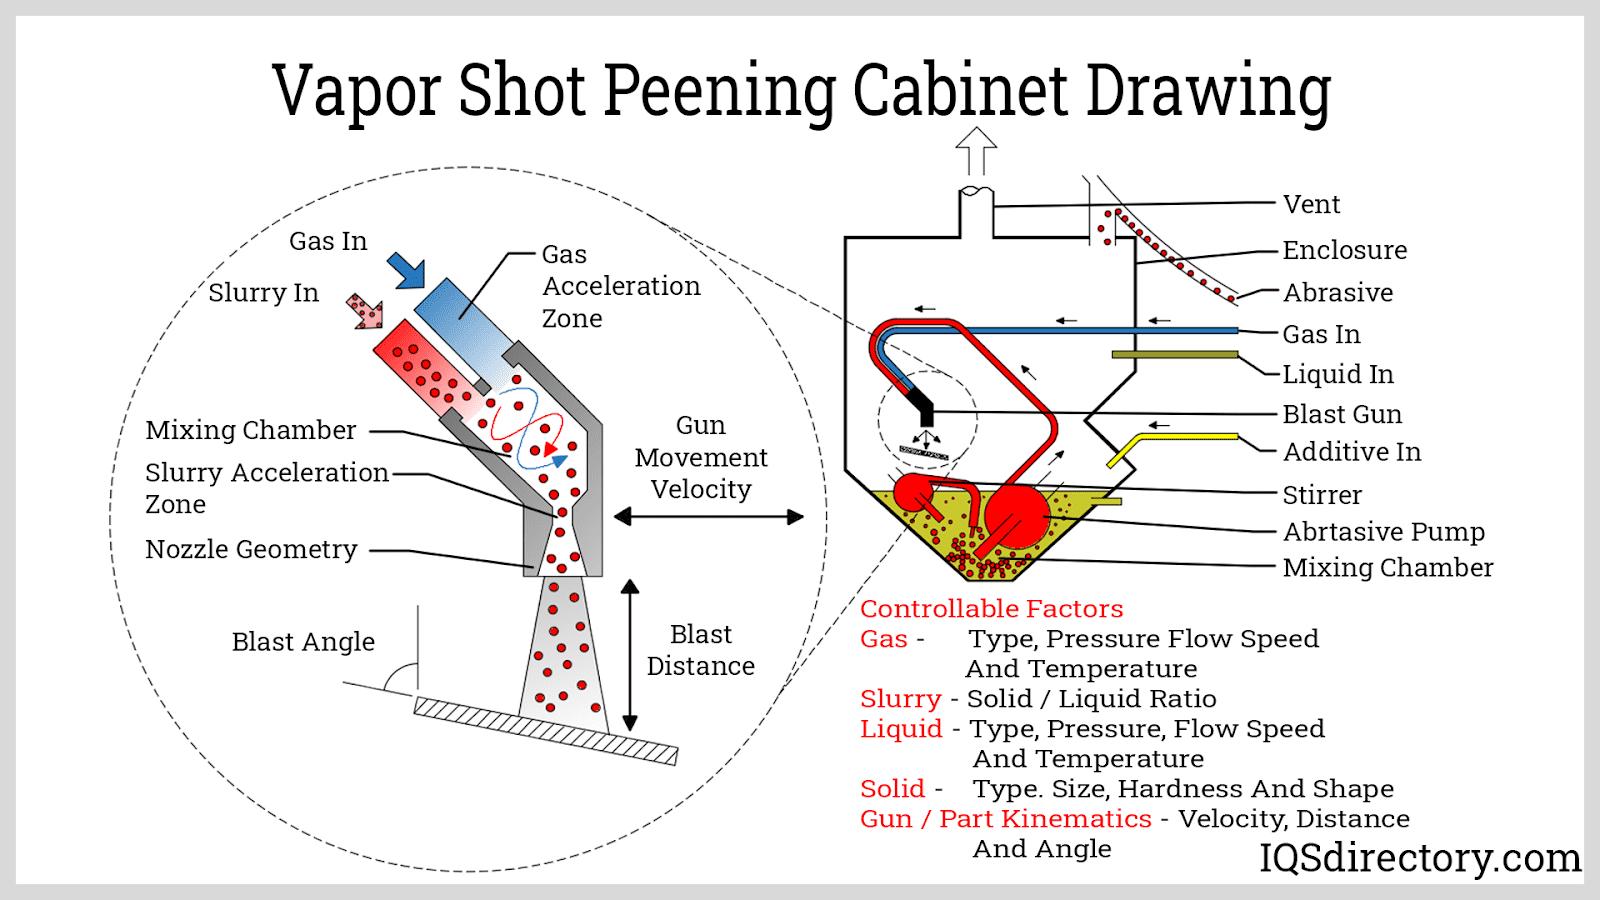 Vapor Shot Peening Cabinet Drawing